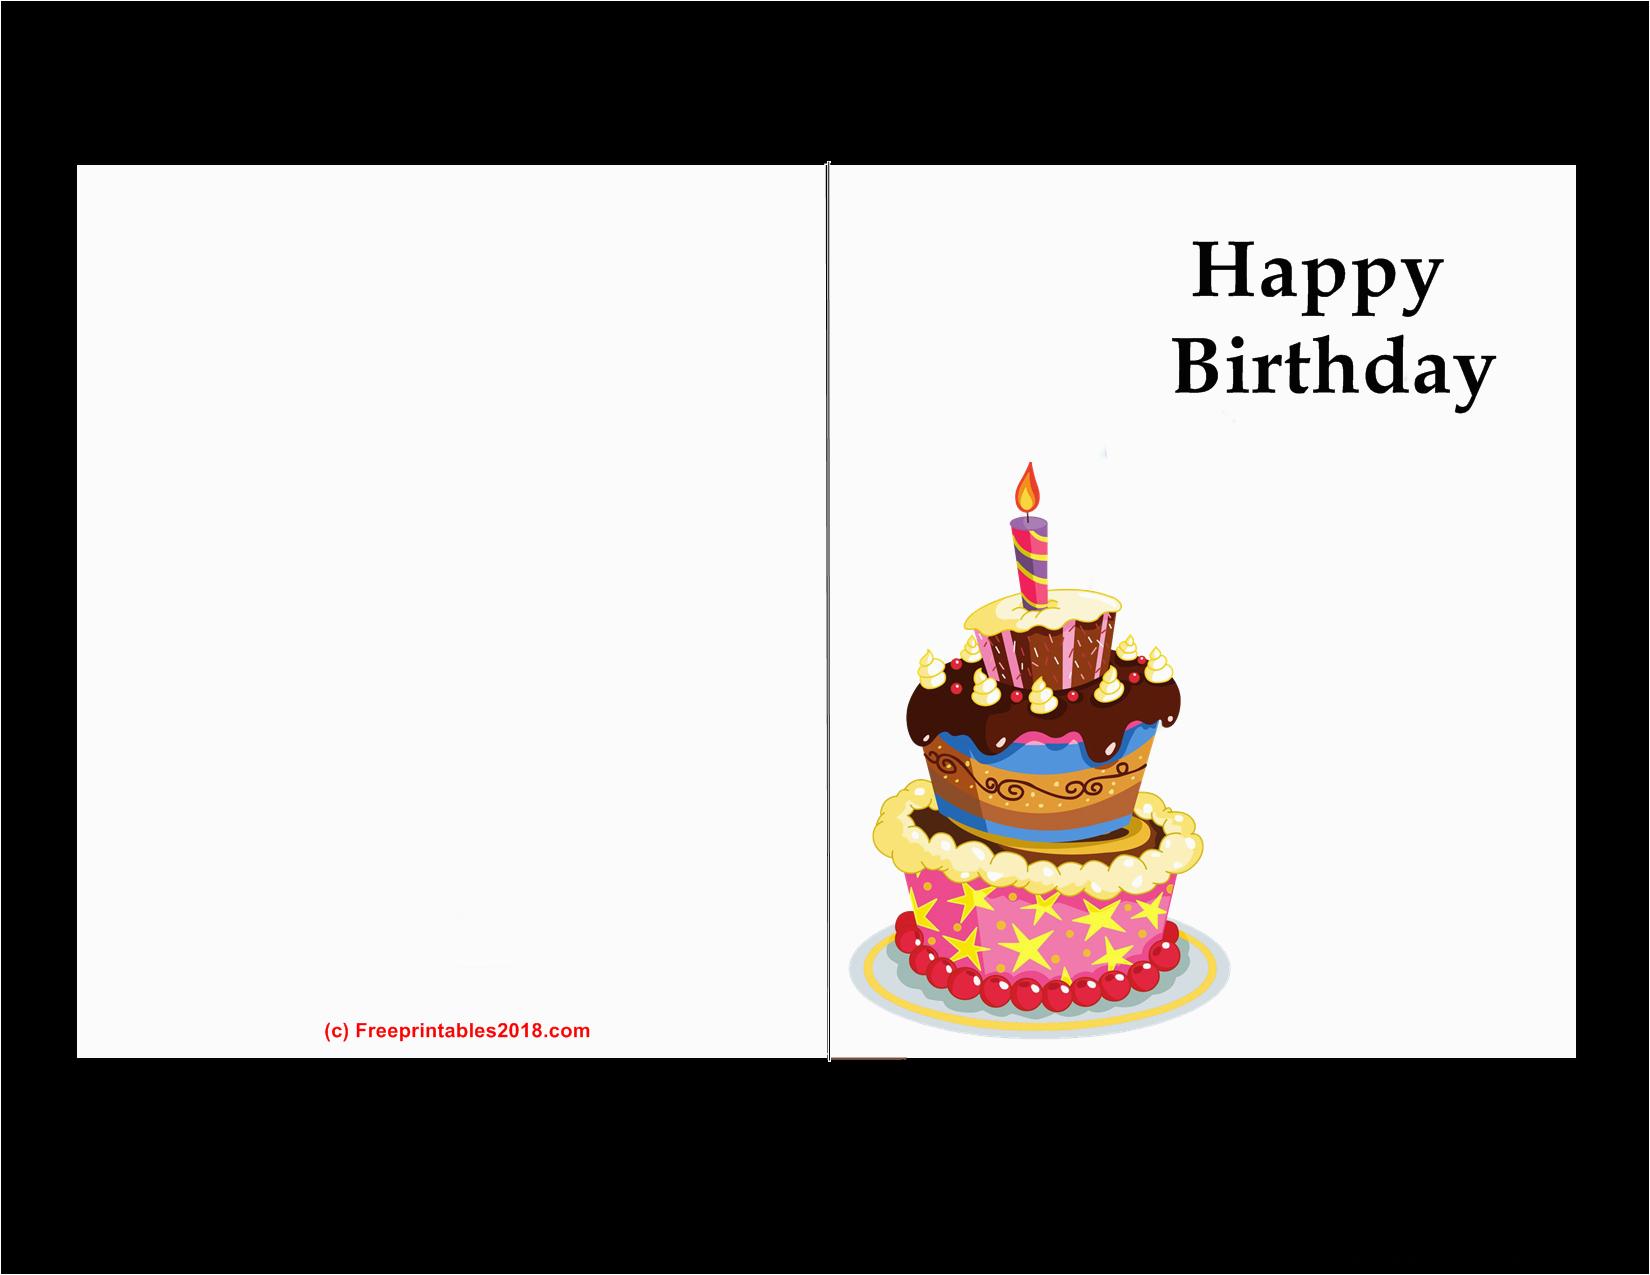 printable birthday cards free printables 2018